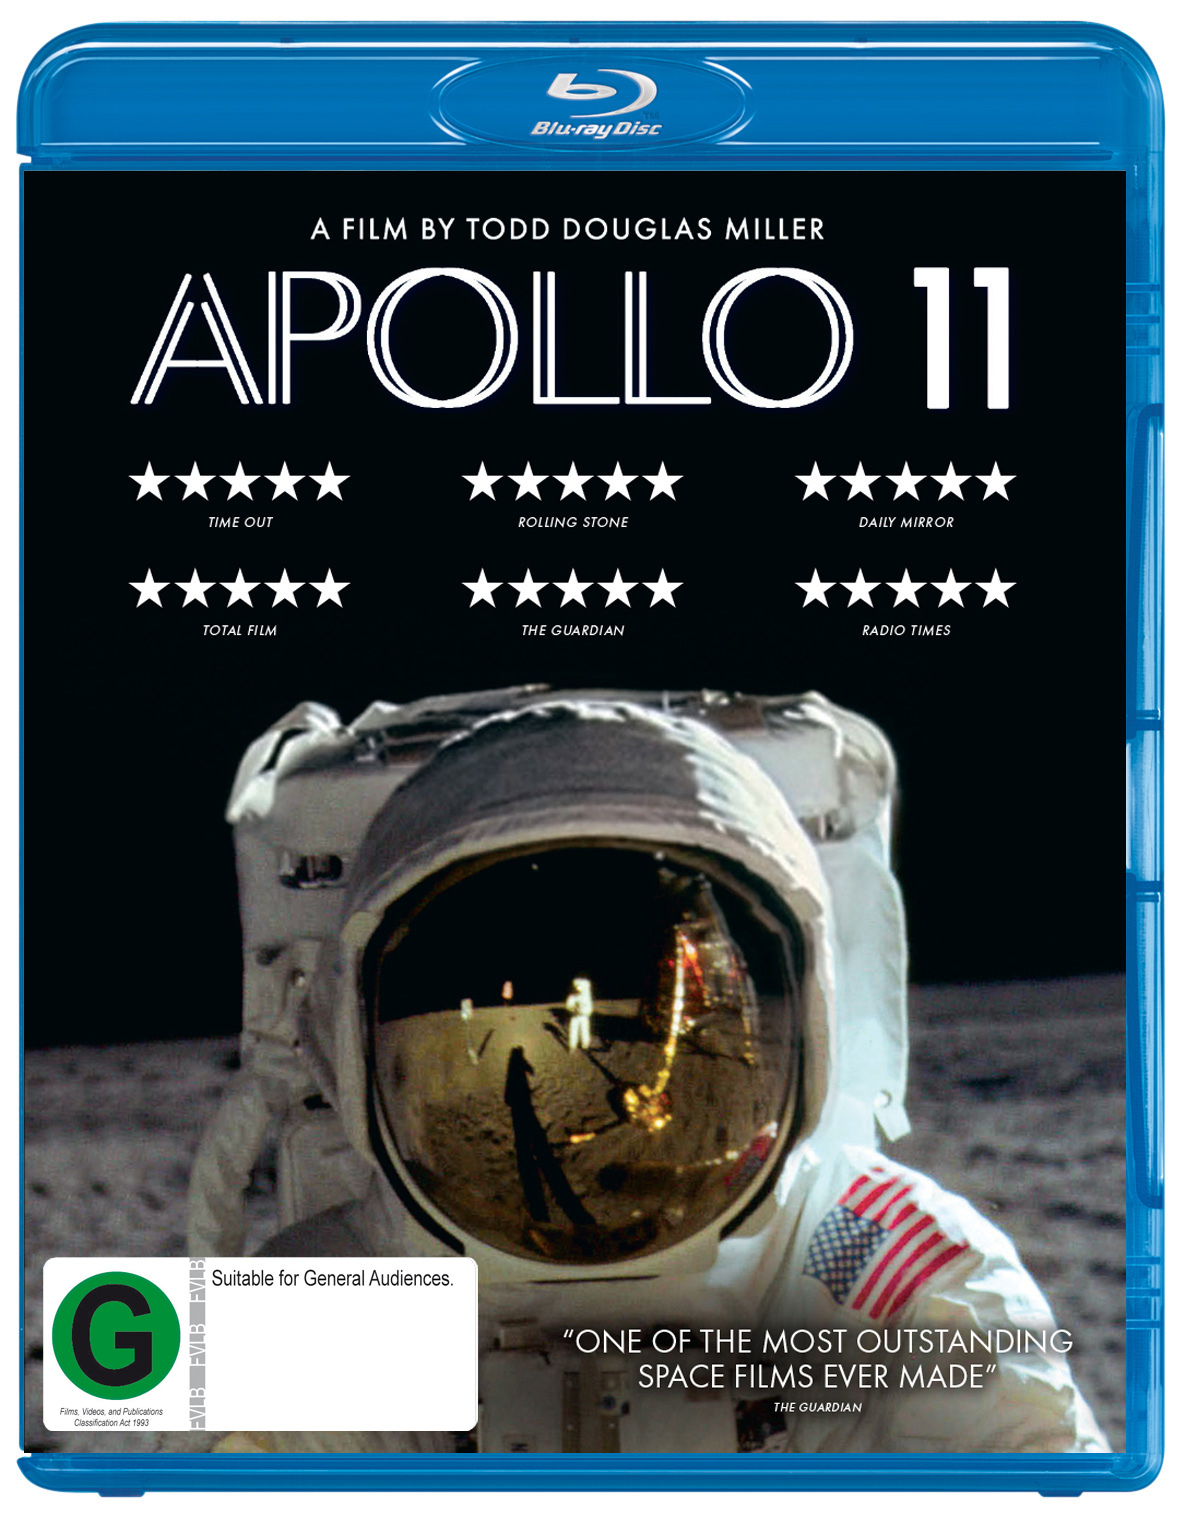 Apollo 11 on Blu-ray image